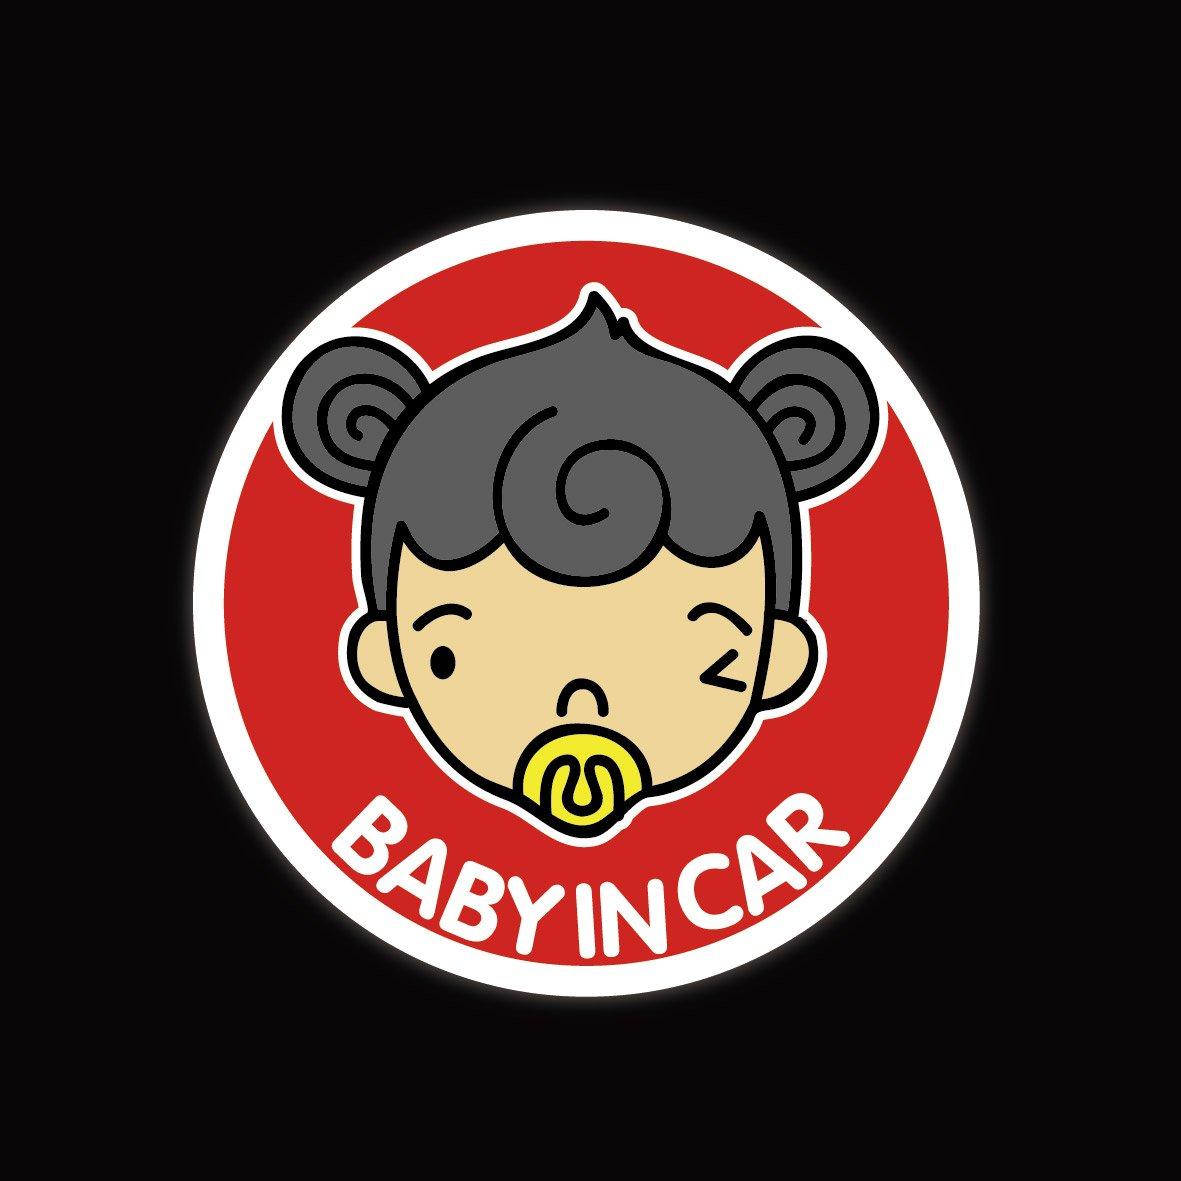 ky 卡艺 汽车贴纸 反光警示贴 女孩 baby in car 搞笑可爱卡通 个性